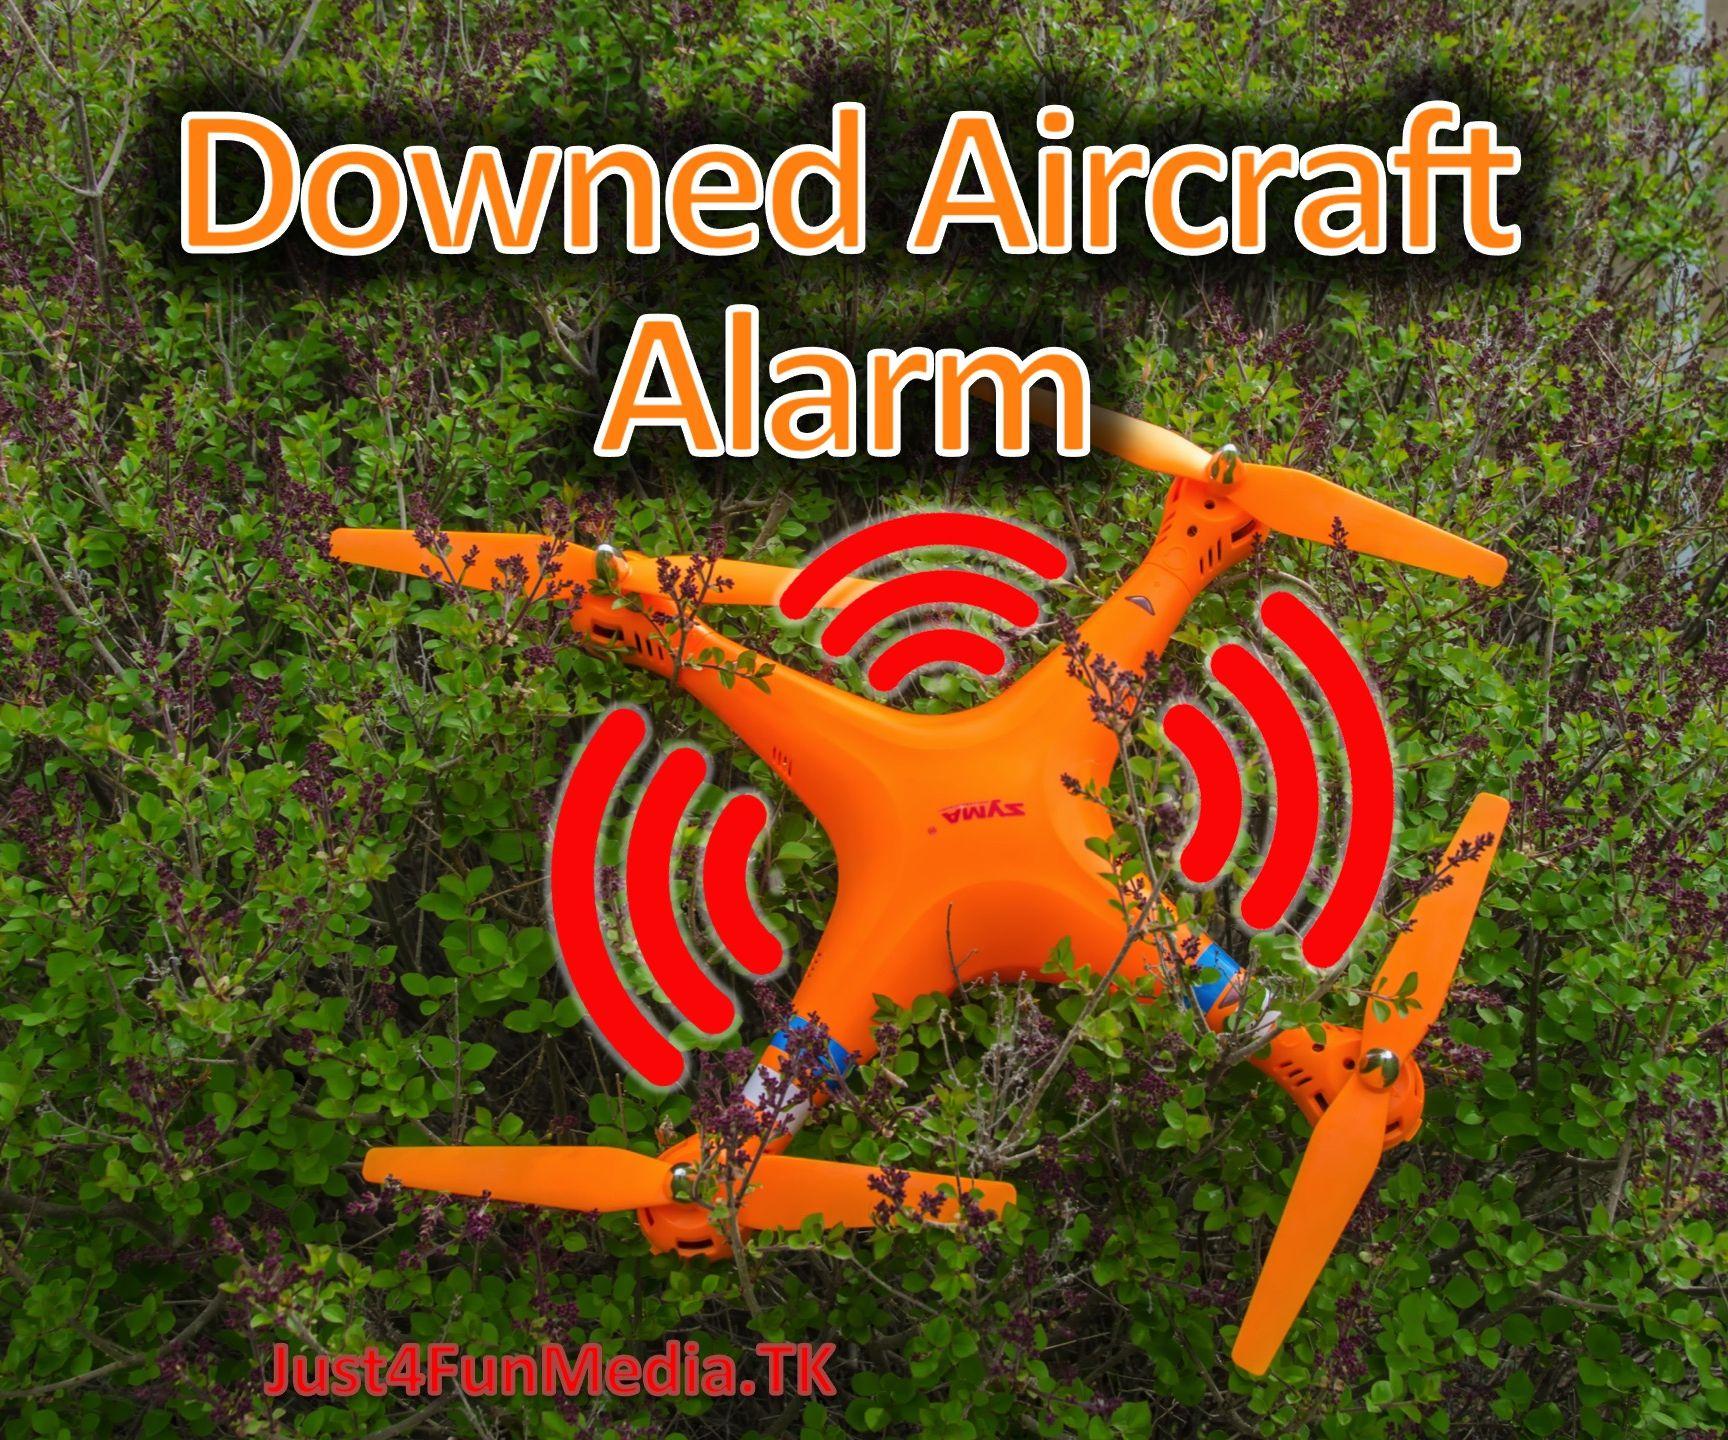 Downed Aircraft Alarm